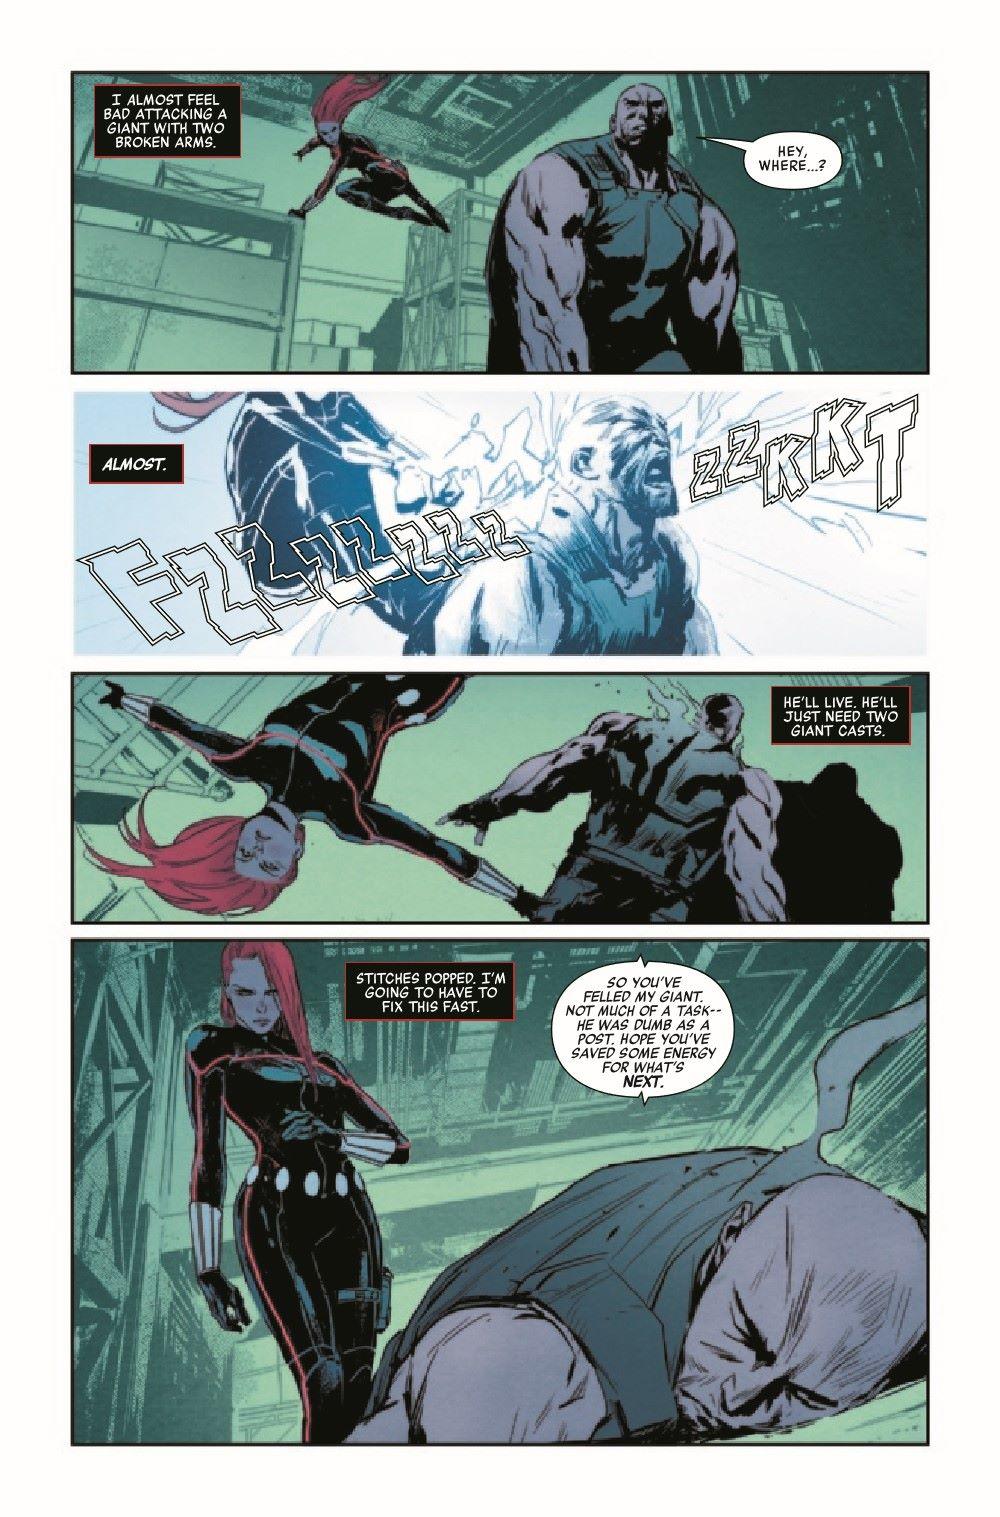 BLAW2020006_Preview-5 ComicList Previews: BLACK WIDOW #6